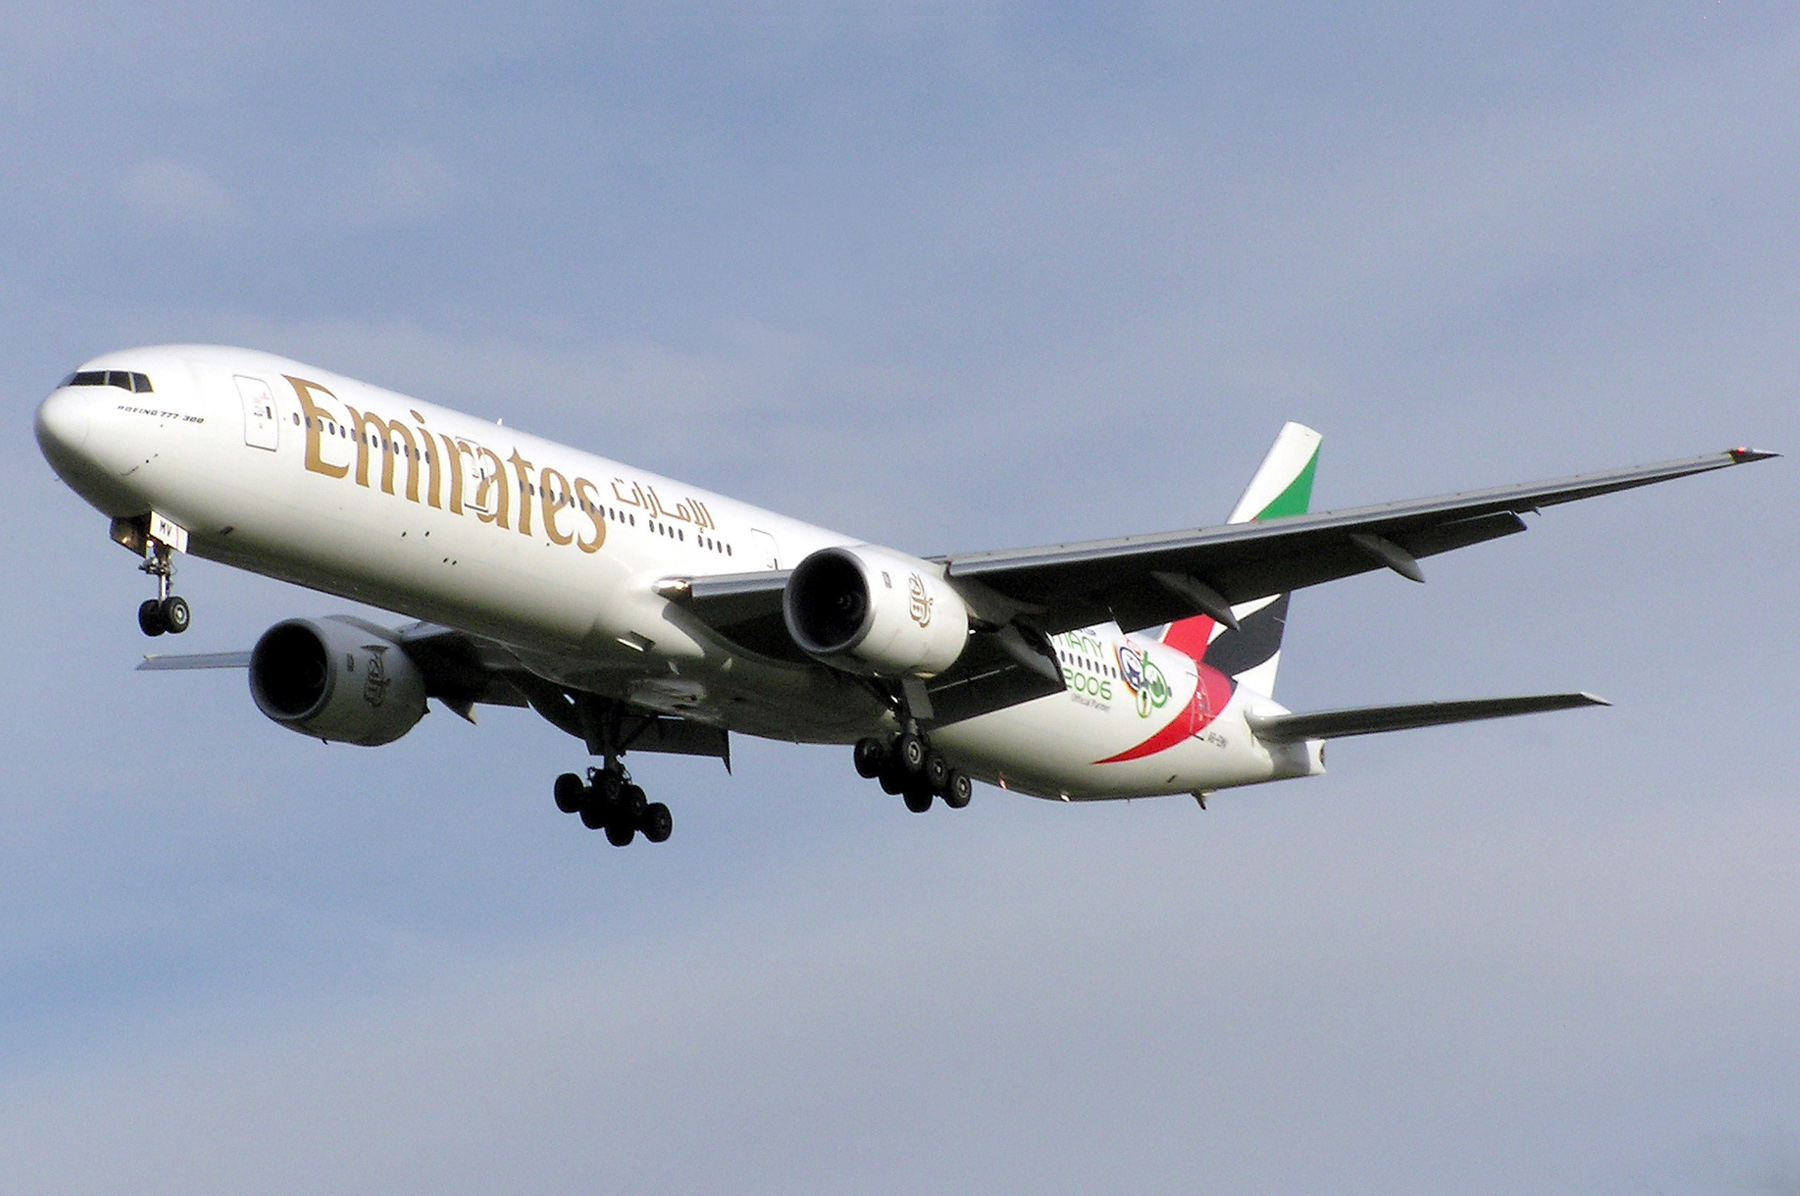 Emirates.b777-300.a6-emv.arp lhr